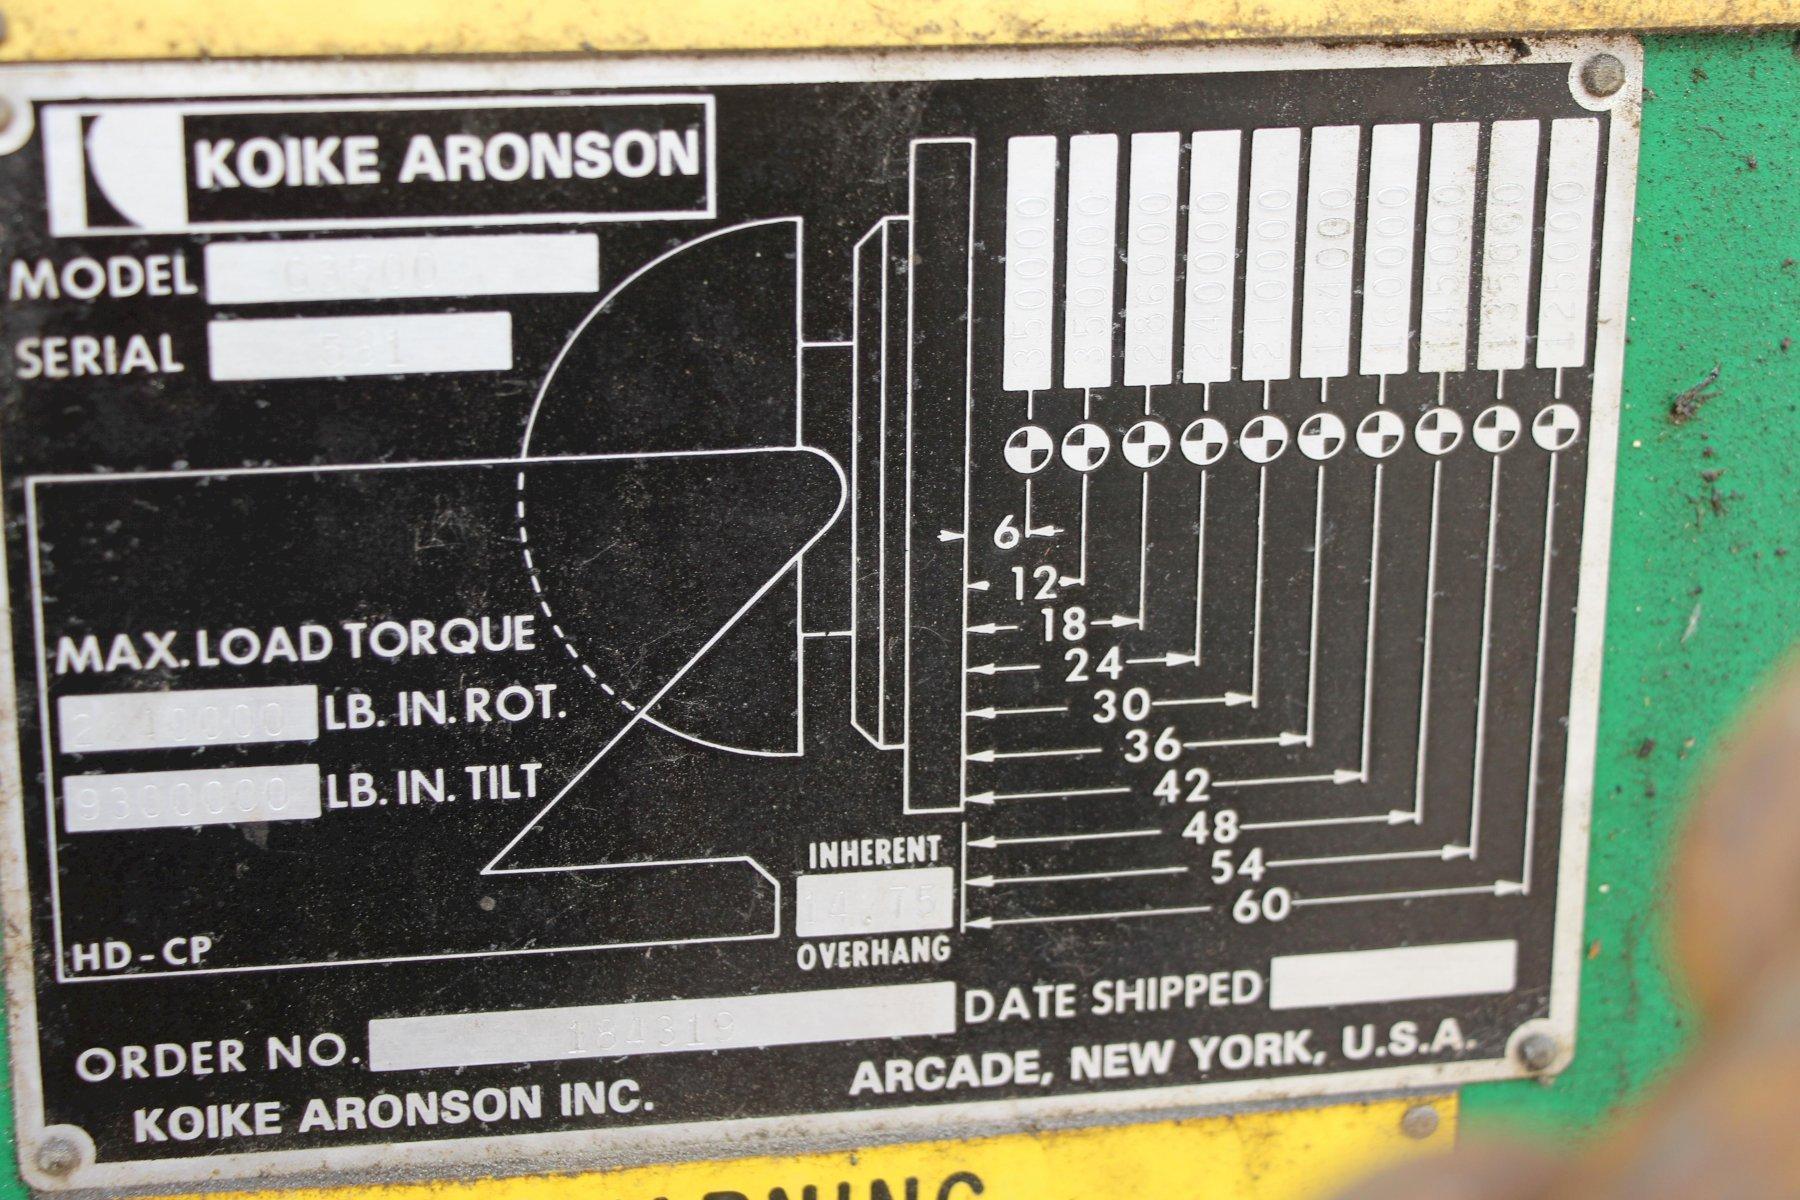 350,000 LBS Aronson Model G3500 Welding Positioner